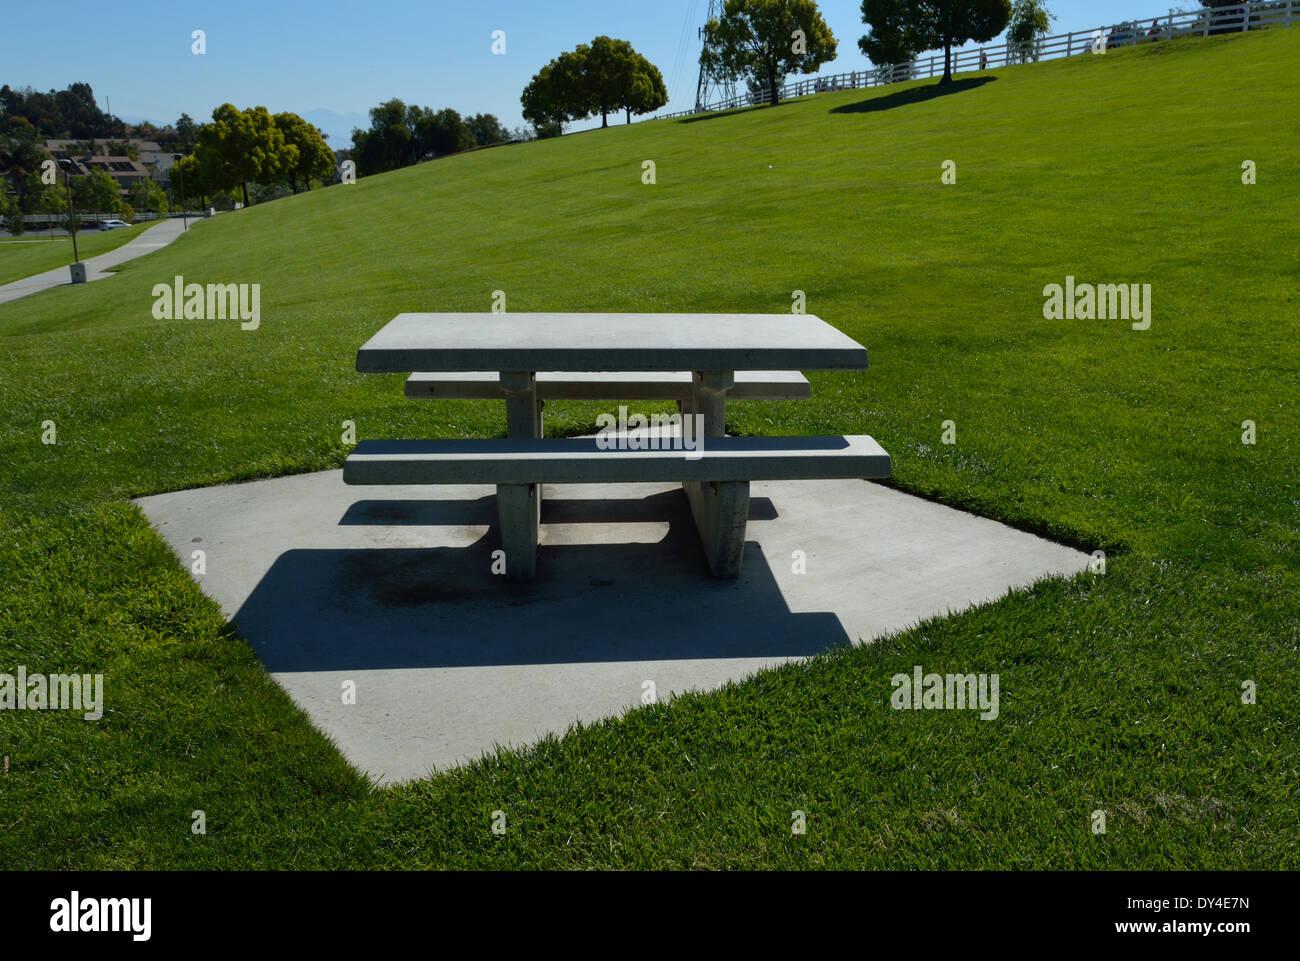 Stone Picnic Table Stock Photo Alamy - Stone picnic table